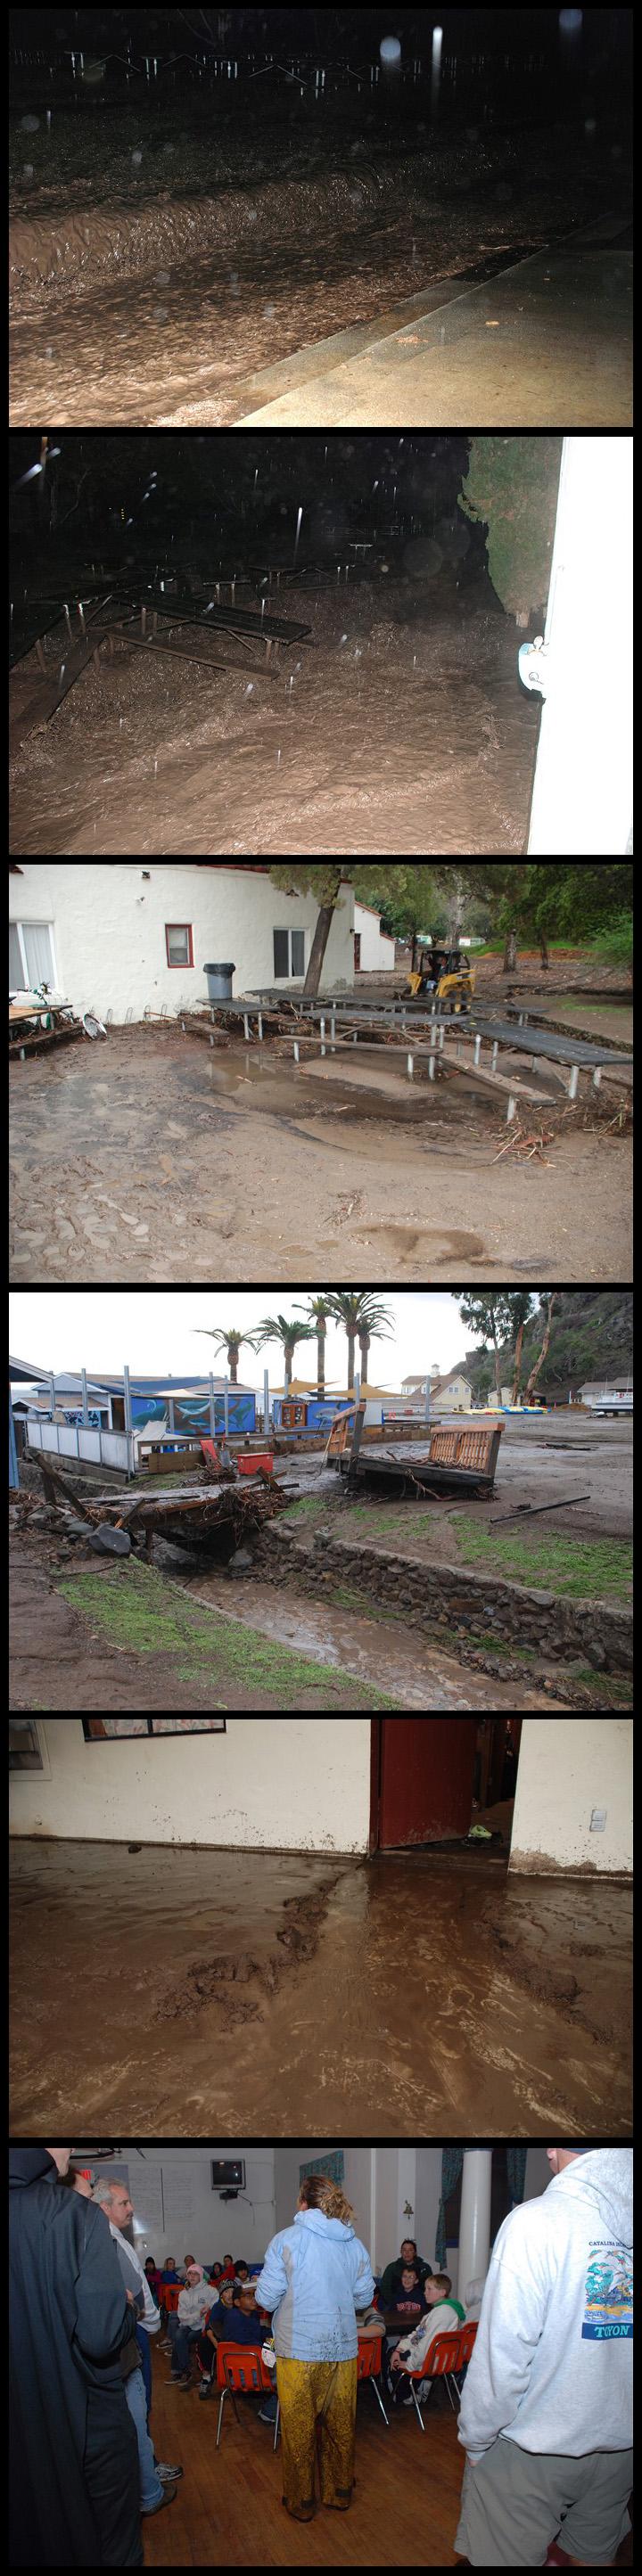 Flash Floods and Mudslides